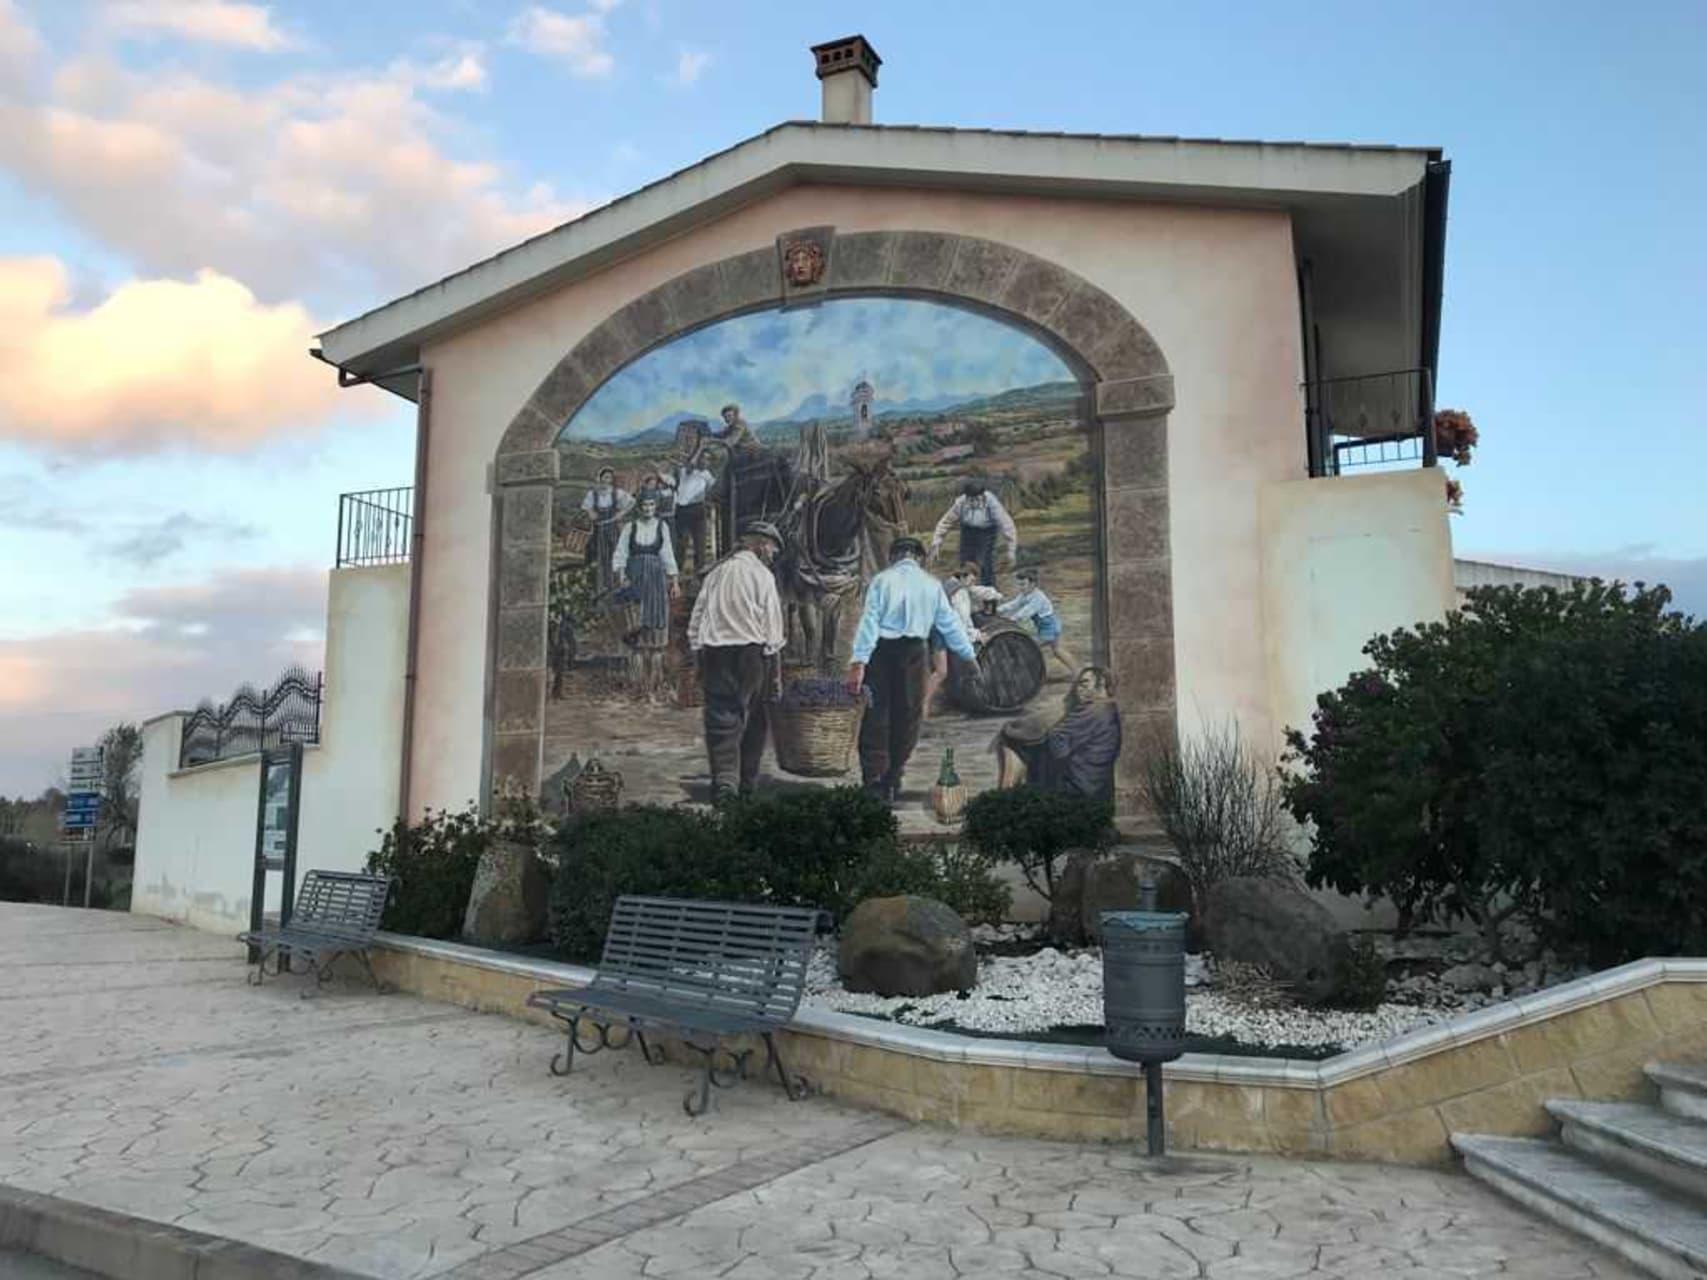 Sardinia - Discovering the Art of Tromple l'Oeil Murals in San Nicolò d'Arcidano